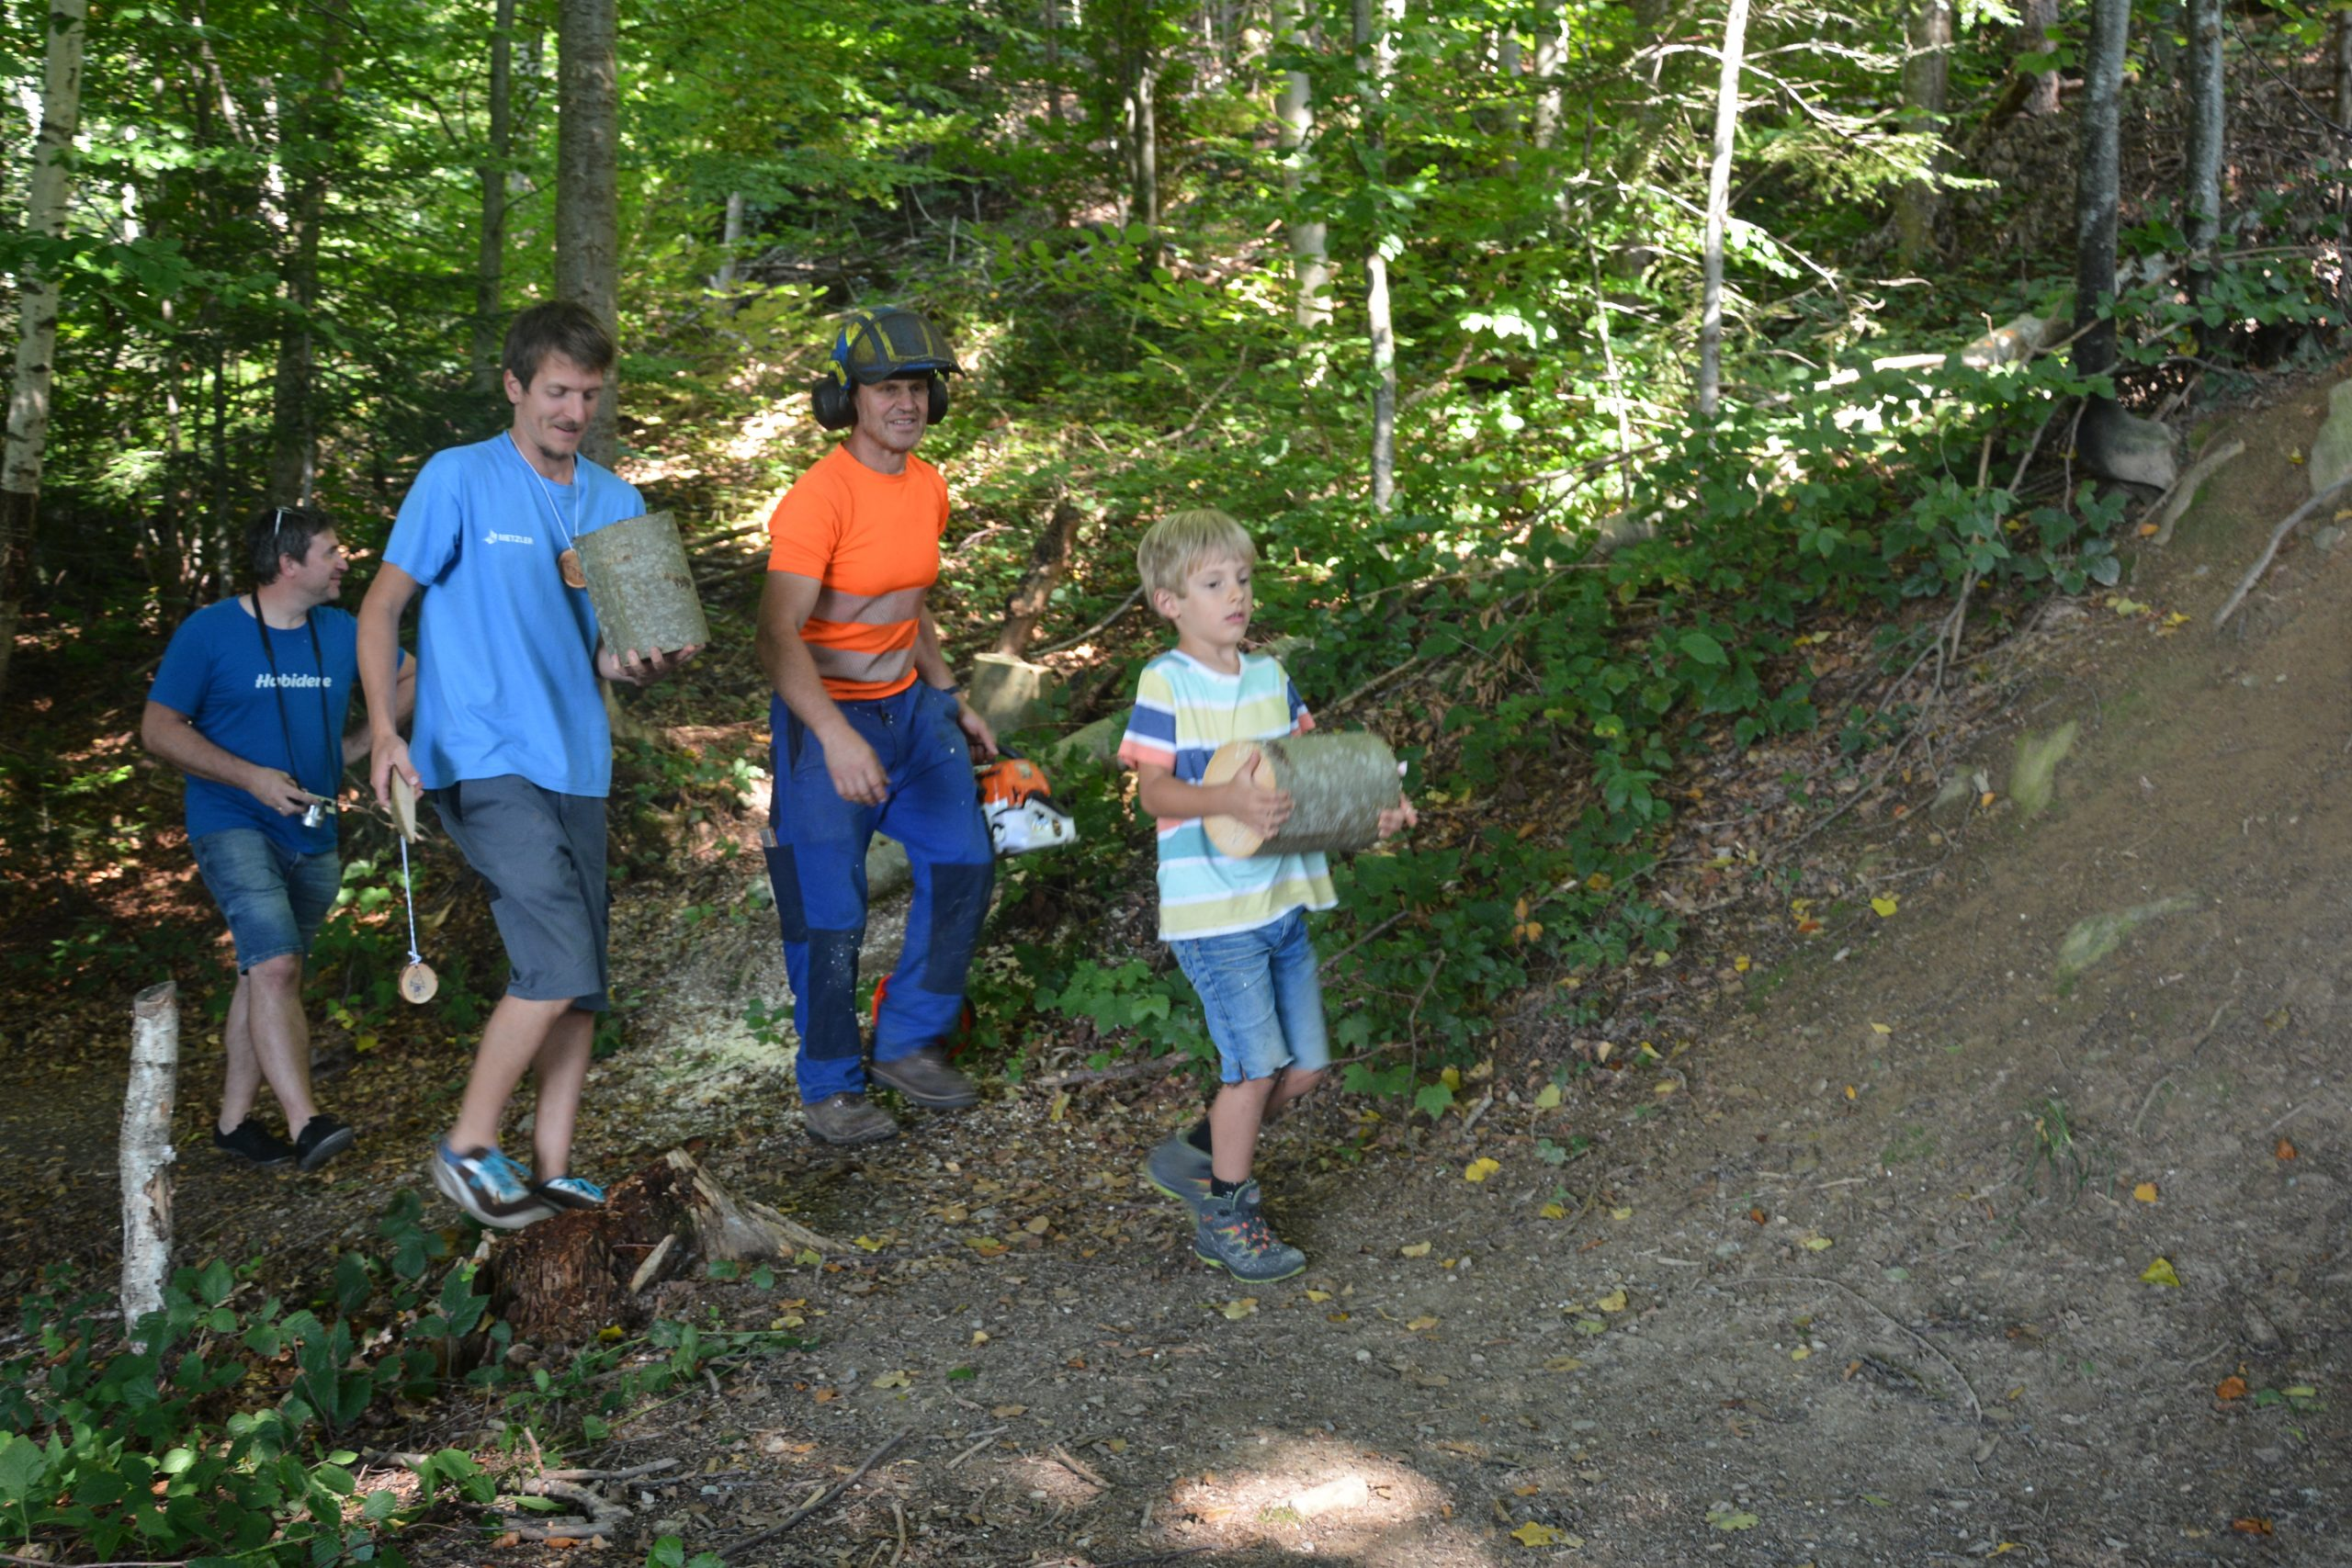 Schnifis: Schaffa im Wald